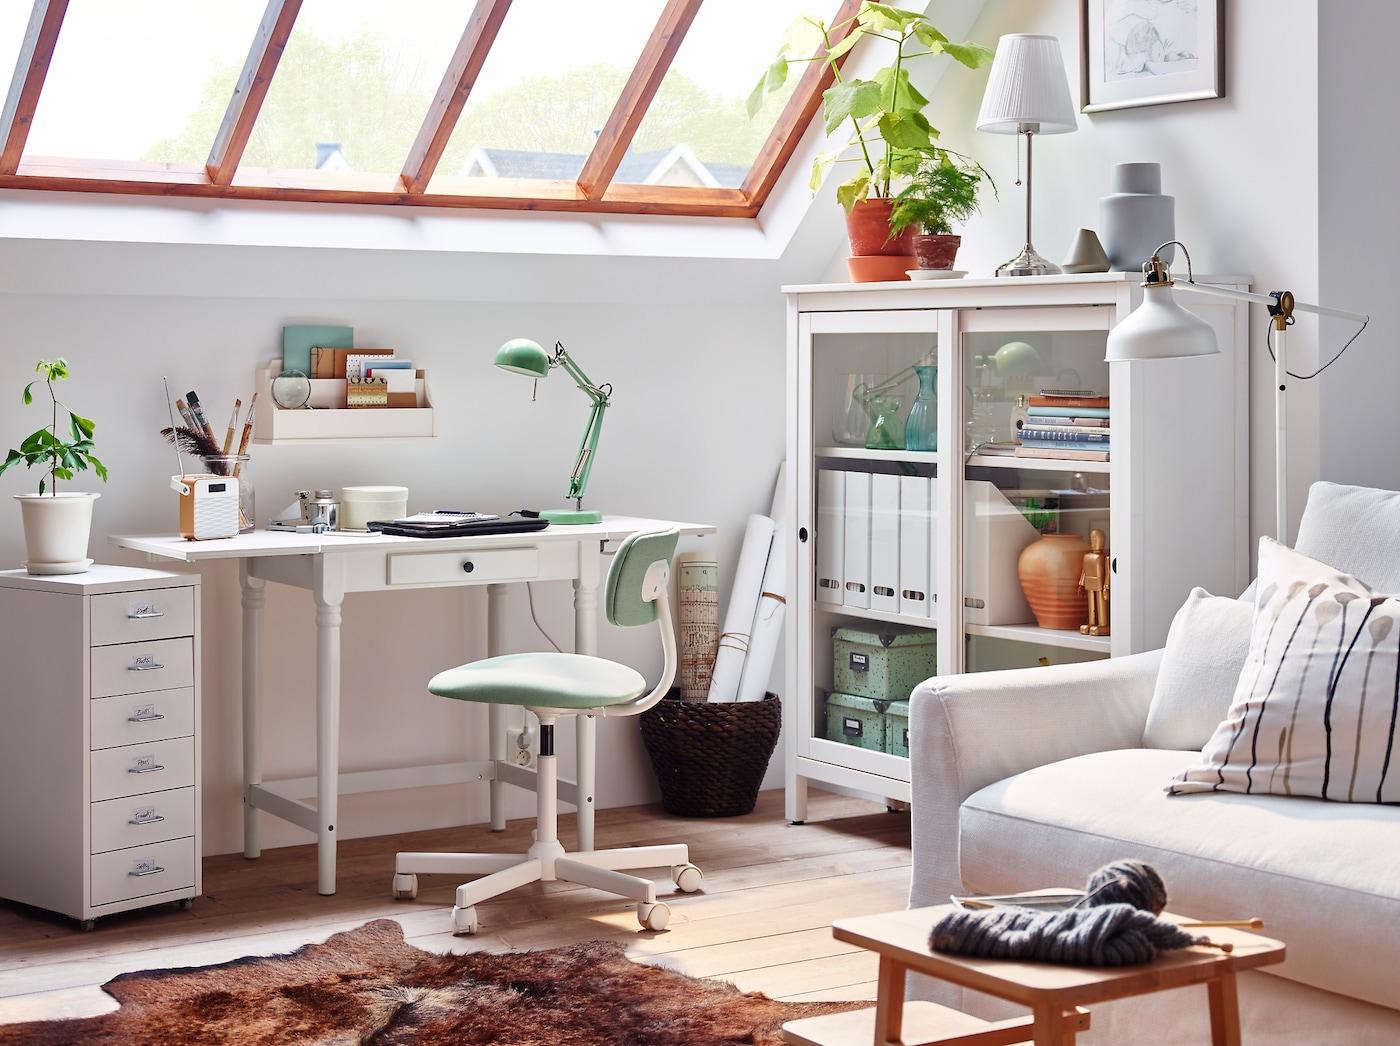 White classic simple desk INGATORP desk